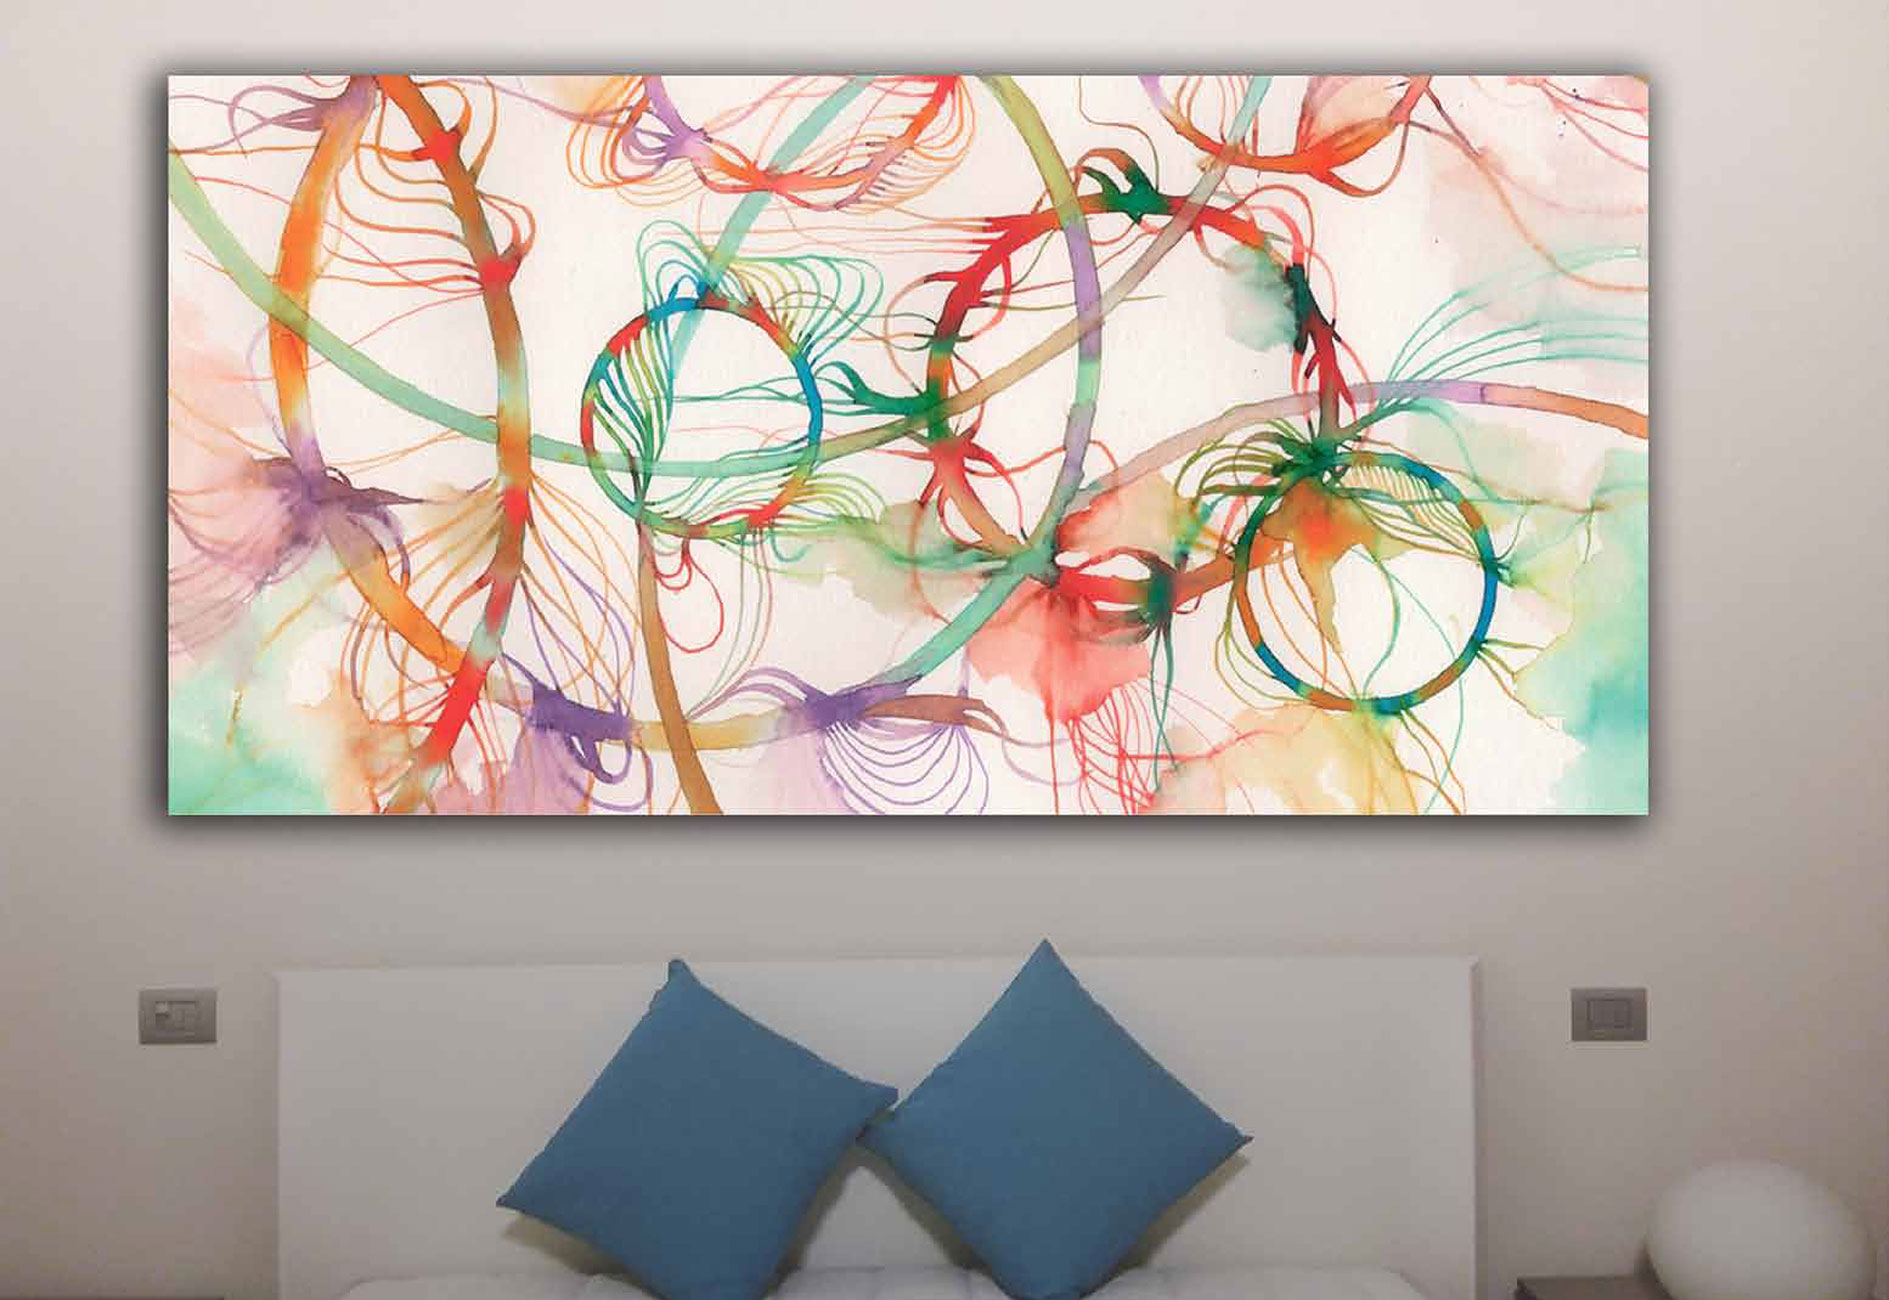 06-floating-colors-ink-on-paper-cm100-x-cm200-2016